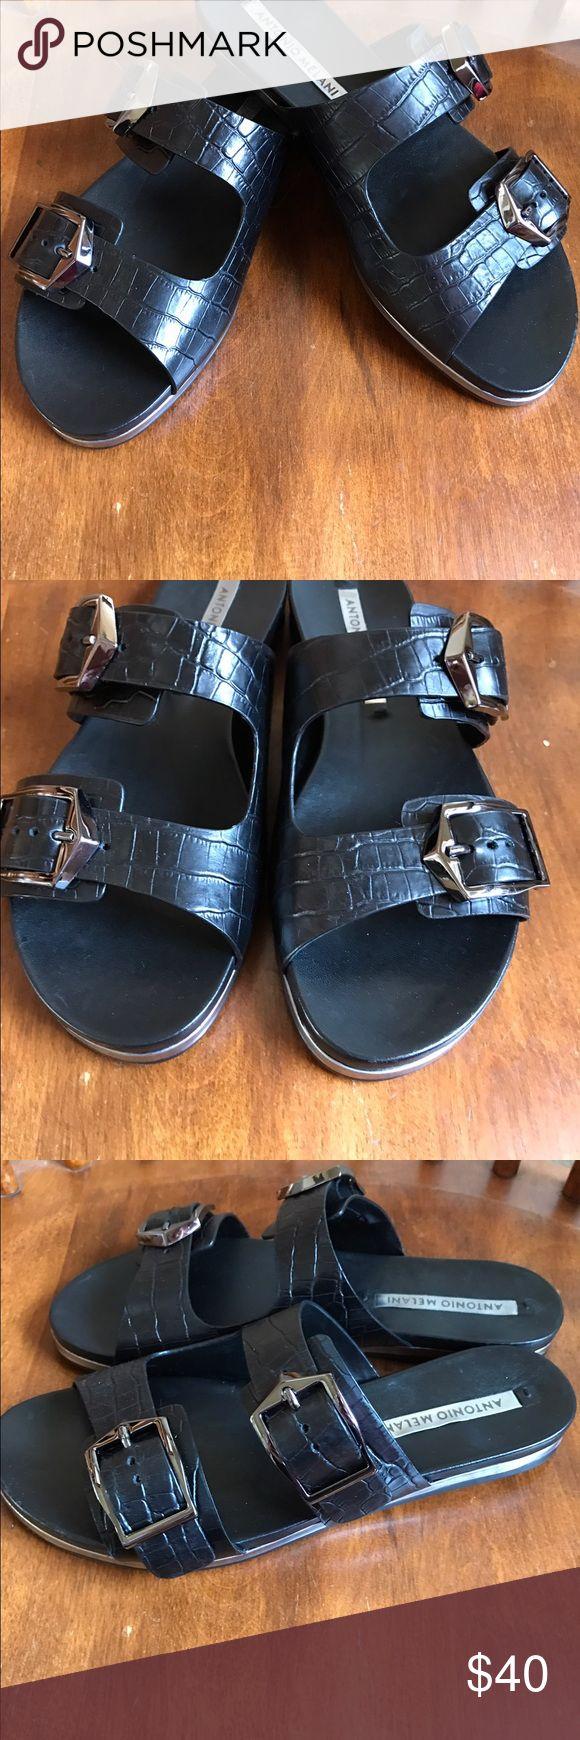 🎀Antonio Melani sandals NWOT Antonio Melani Women's flat slide banded sandals ANTONIO MELANI Shoes Sandals